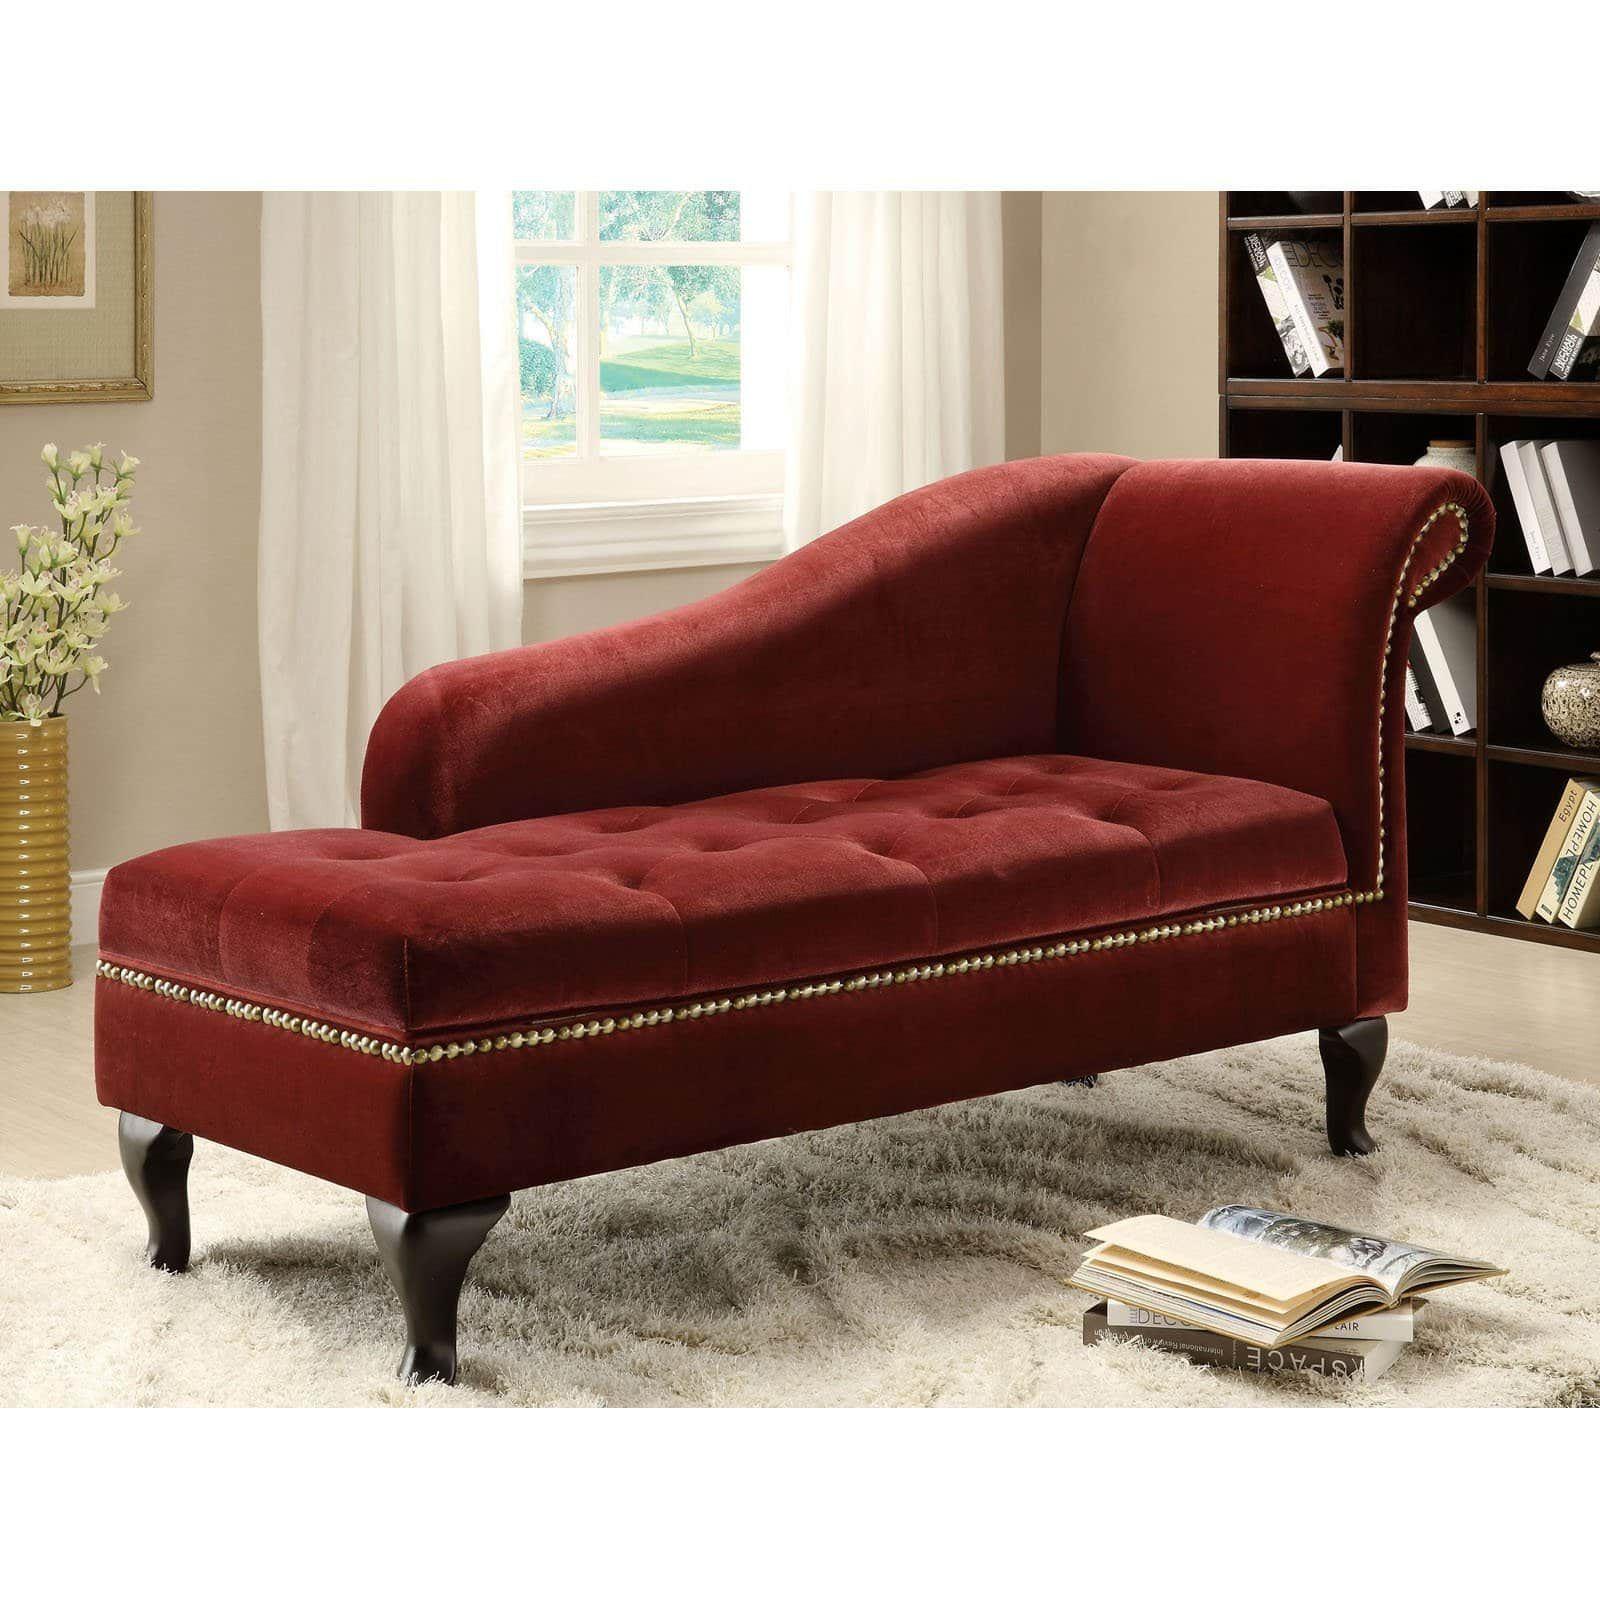 Furniture of america visage fabric storage chaise